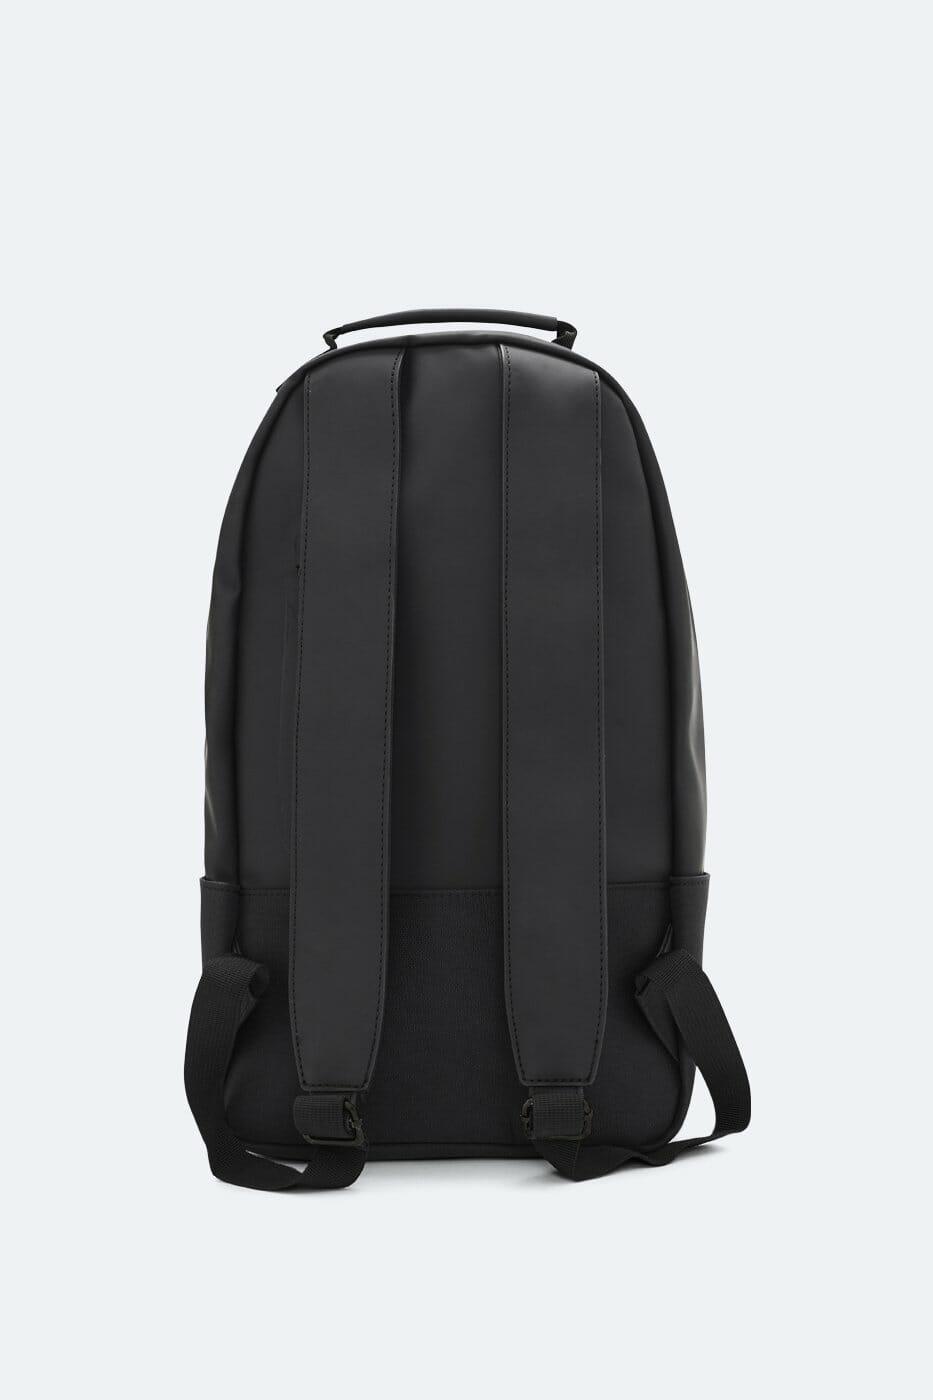 City_Backpack-Bags-1292-01_Black-4_1400x1400